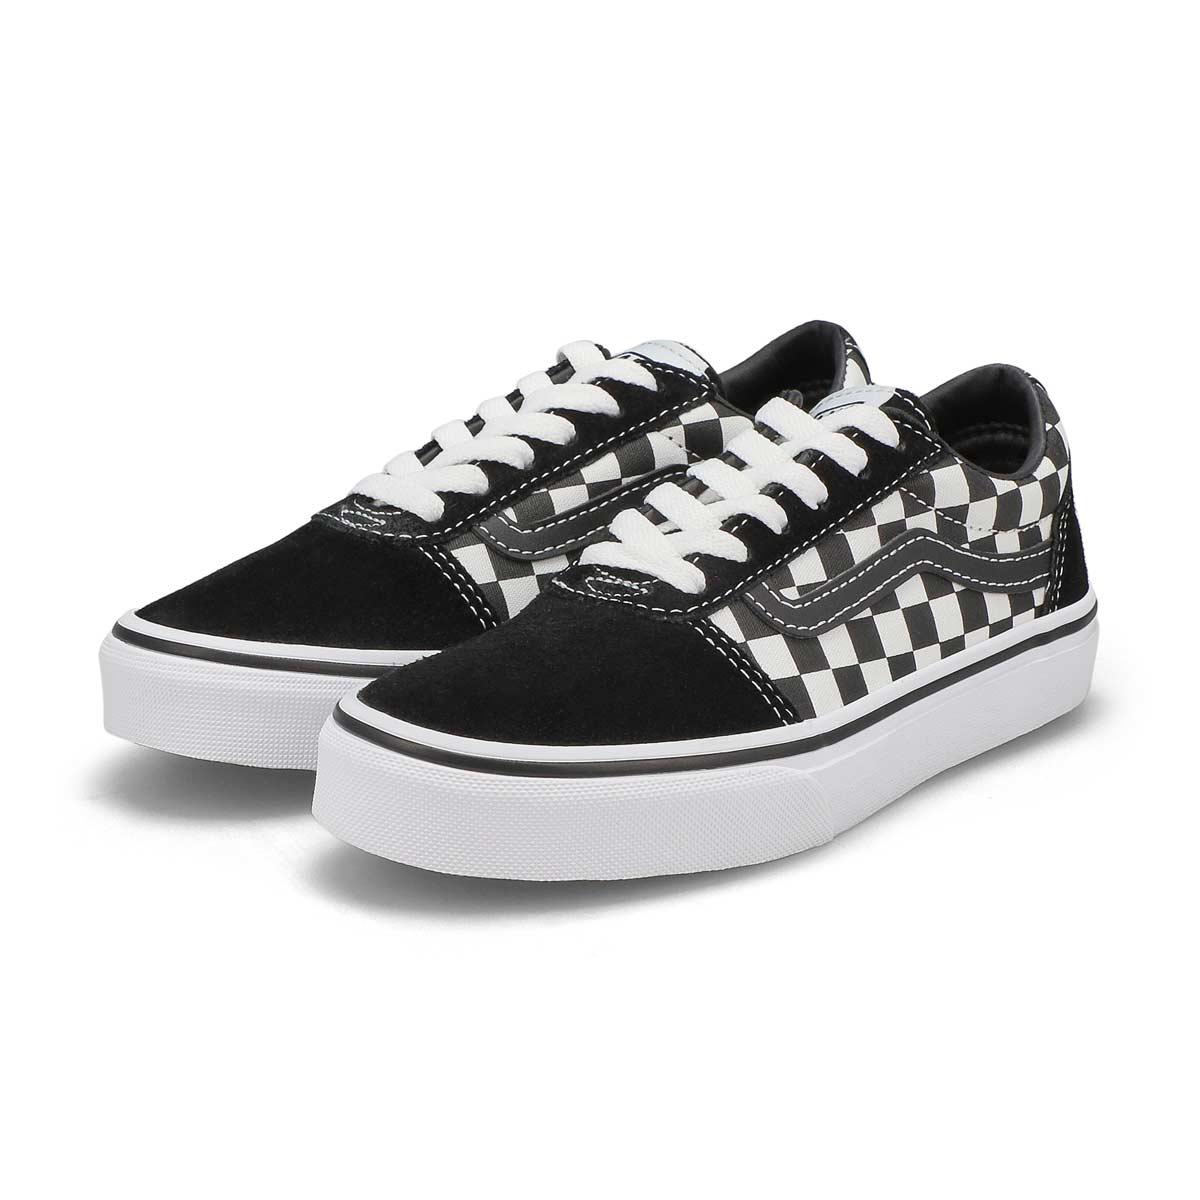 Boys' Ward Sneaker - Checkered Black/White